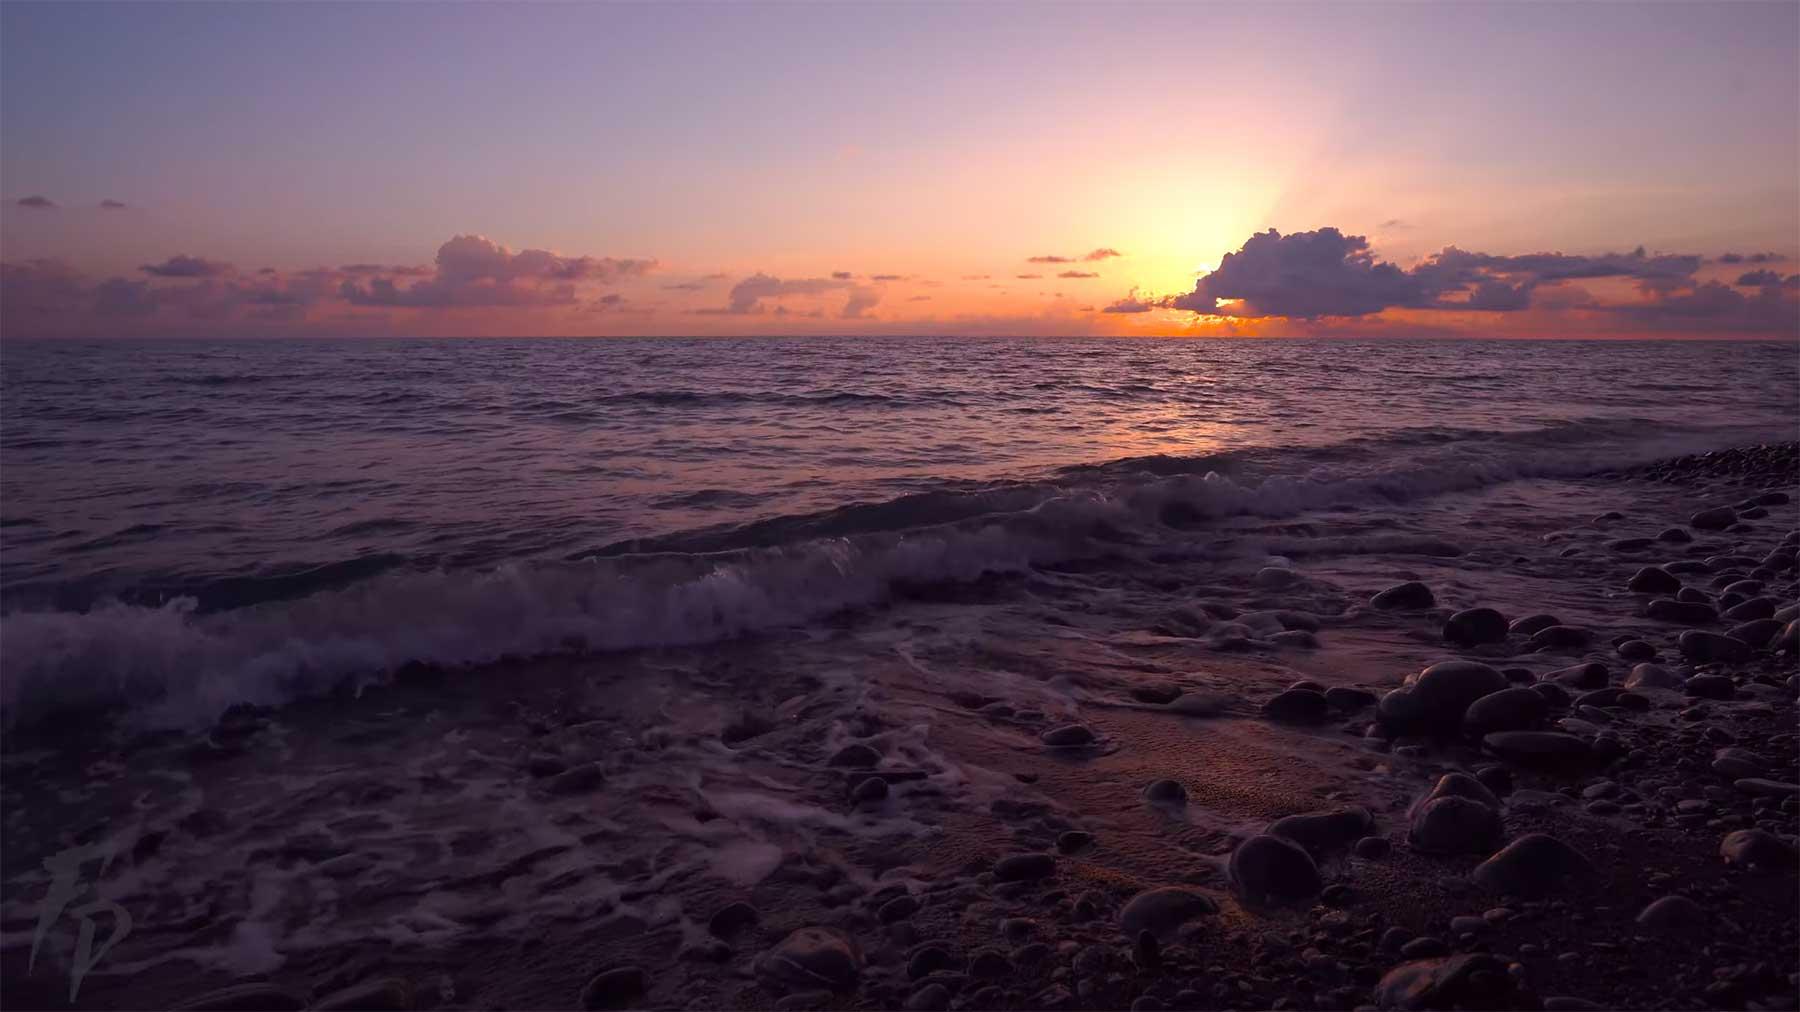 8 Stunden Meeresrauschen bei Sonnenuntergang